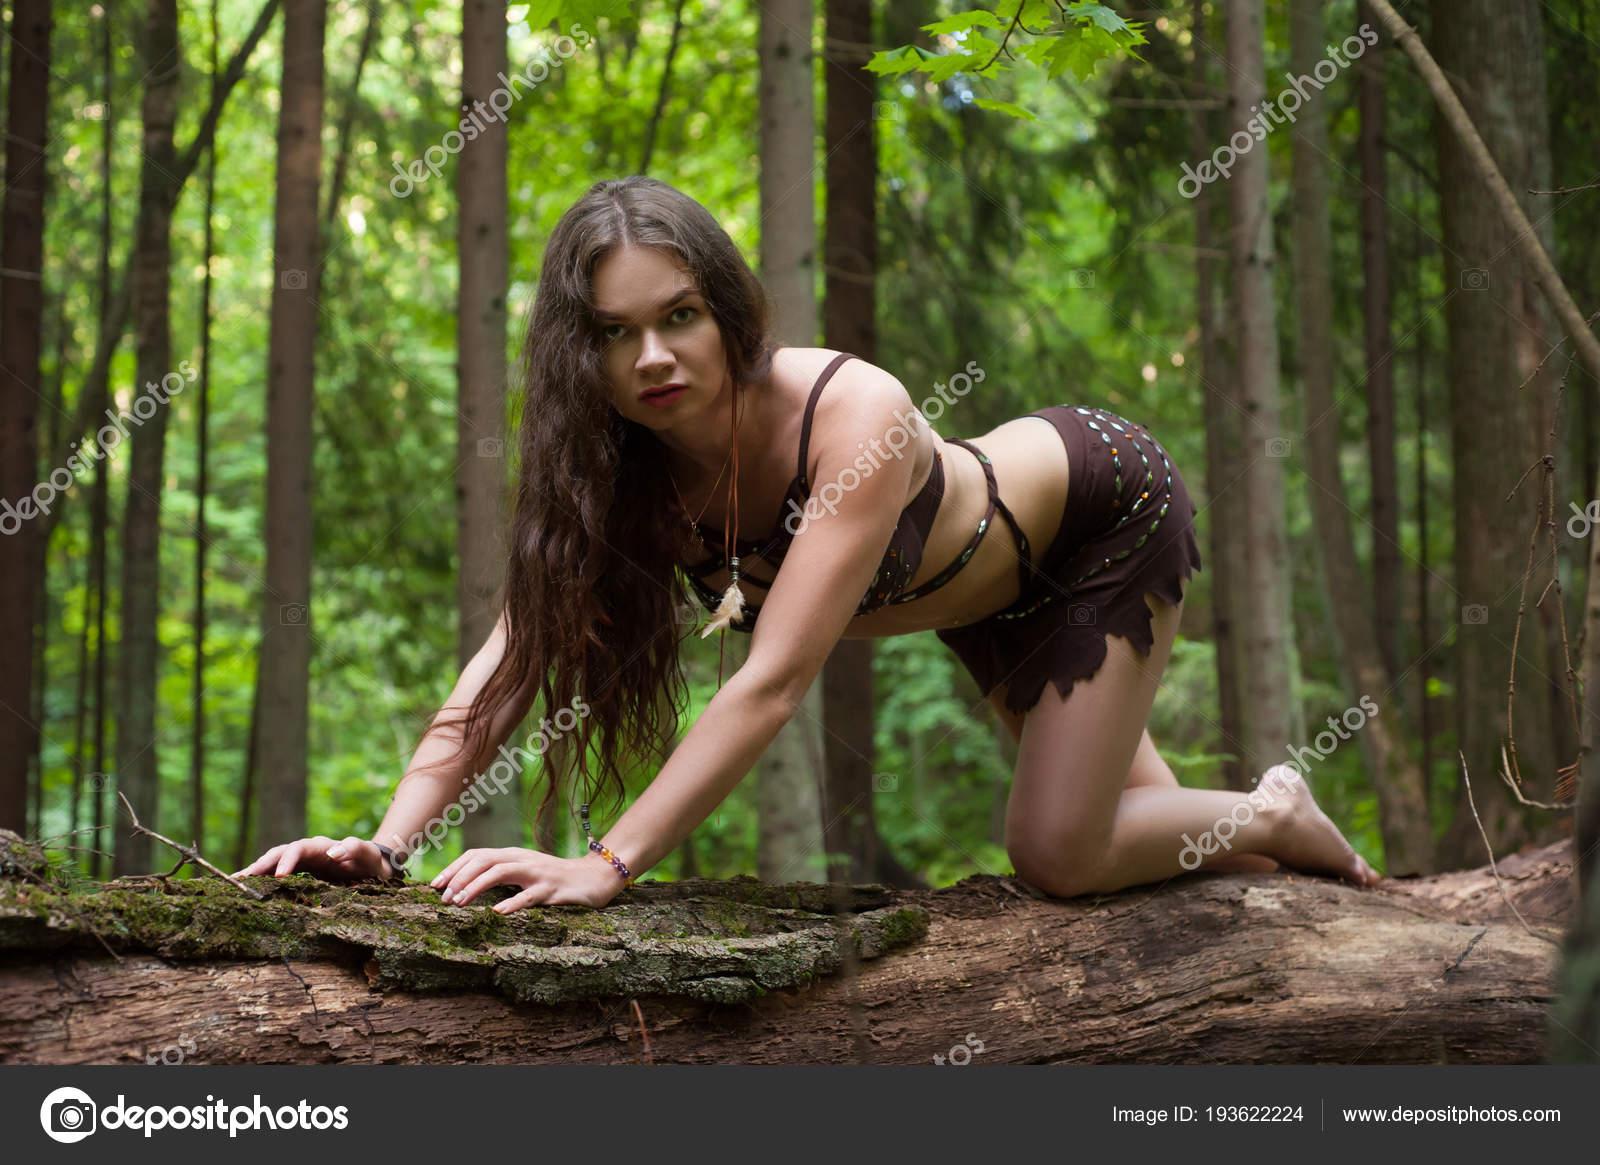 https://st3.depositphotos.com/1521357/19362/i/1600/depositphotos_193622224-stock-photo-wild-savage-woman.jpg